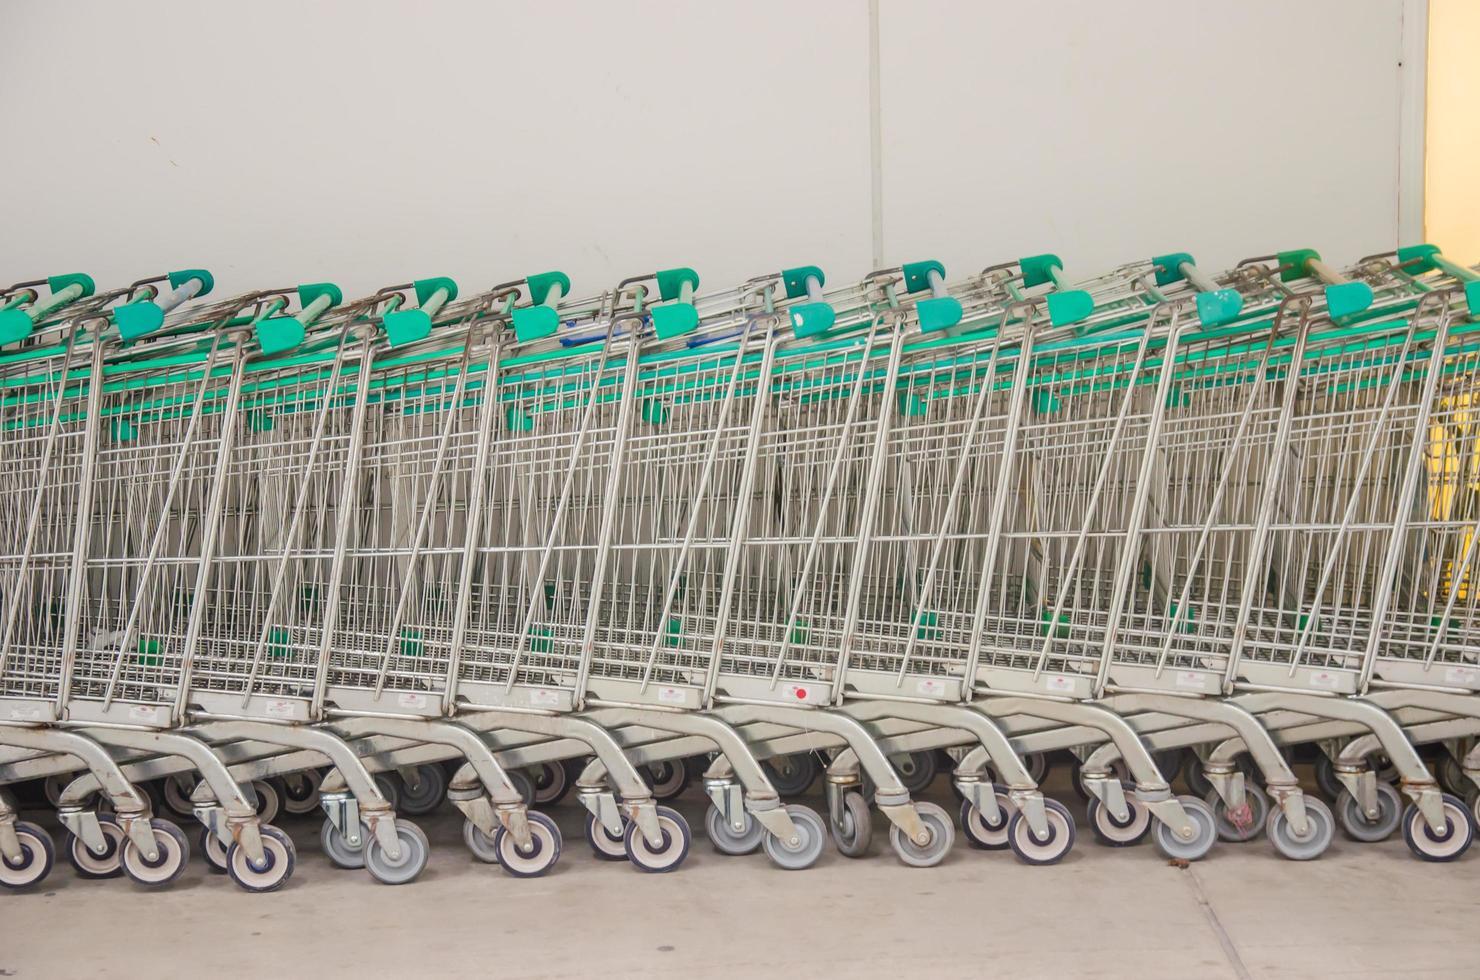 carritos de compras en un supermercado foto